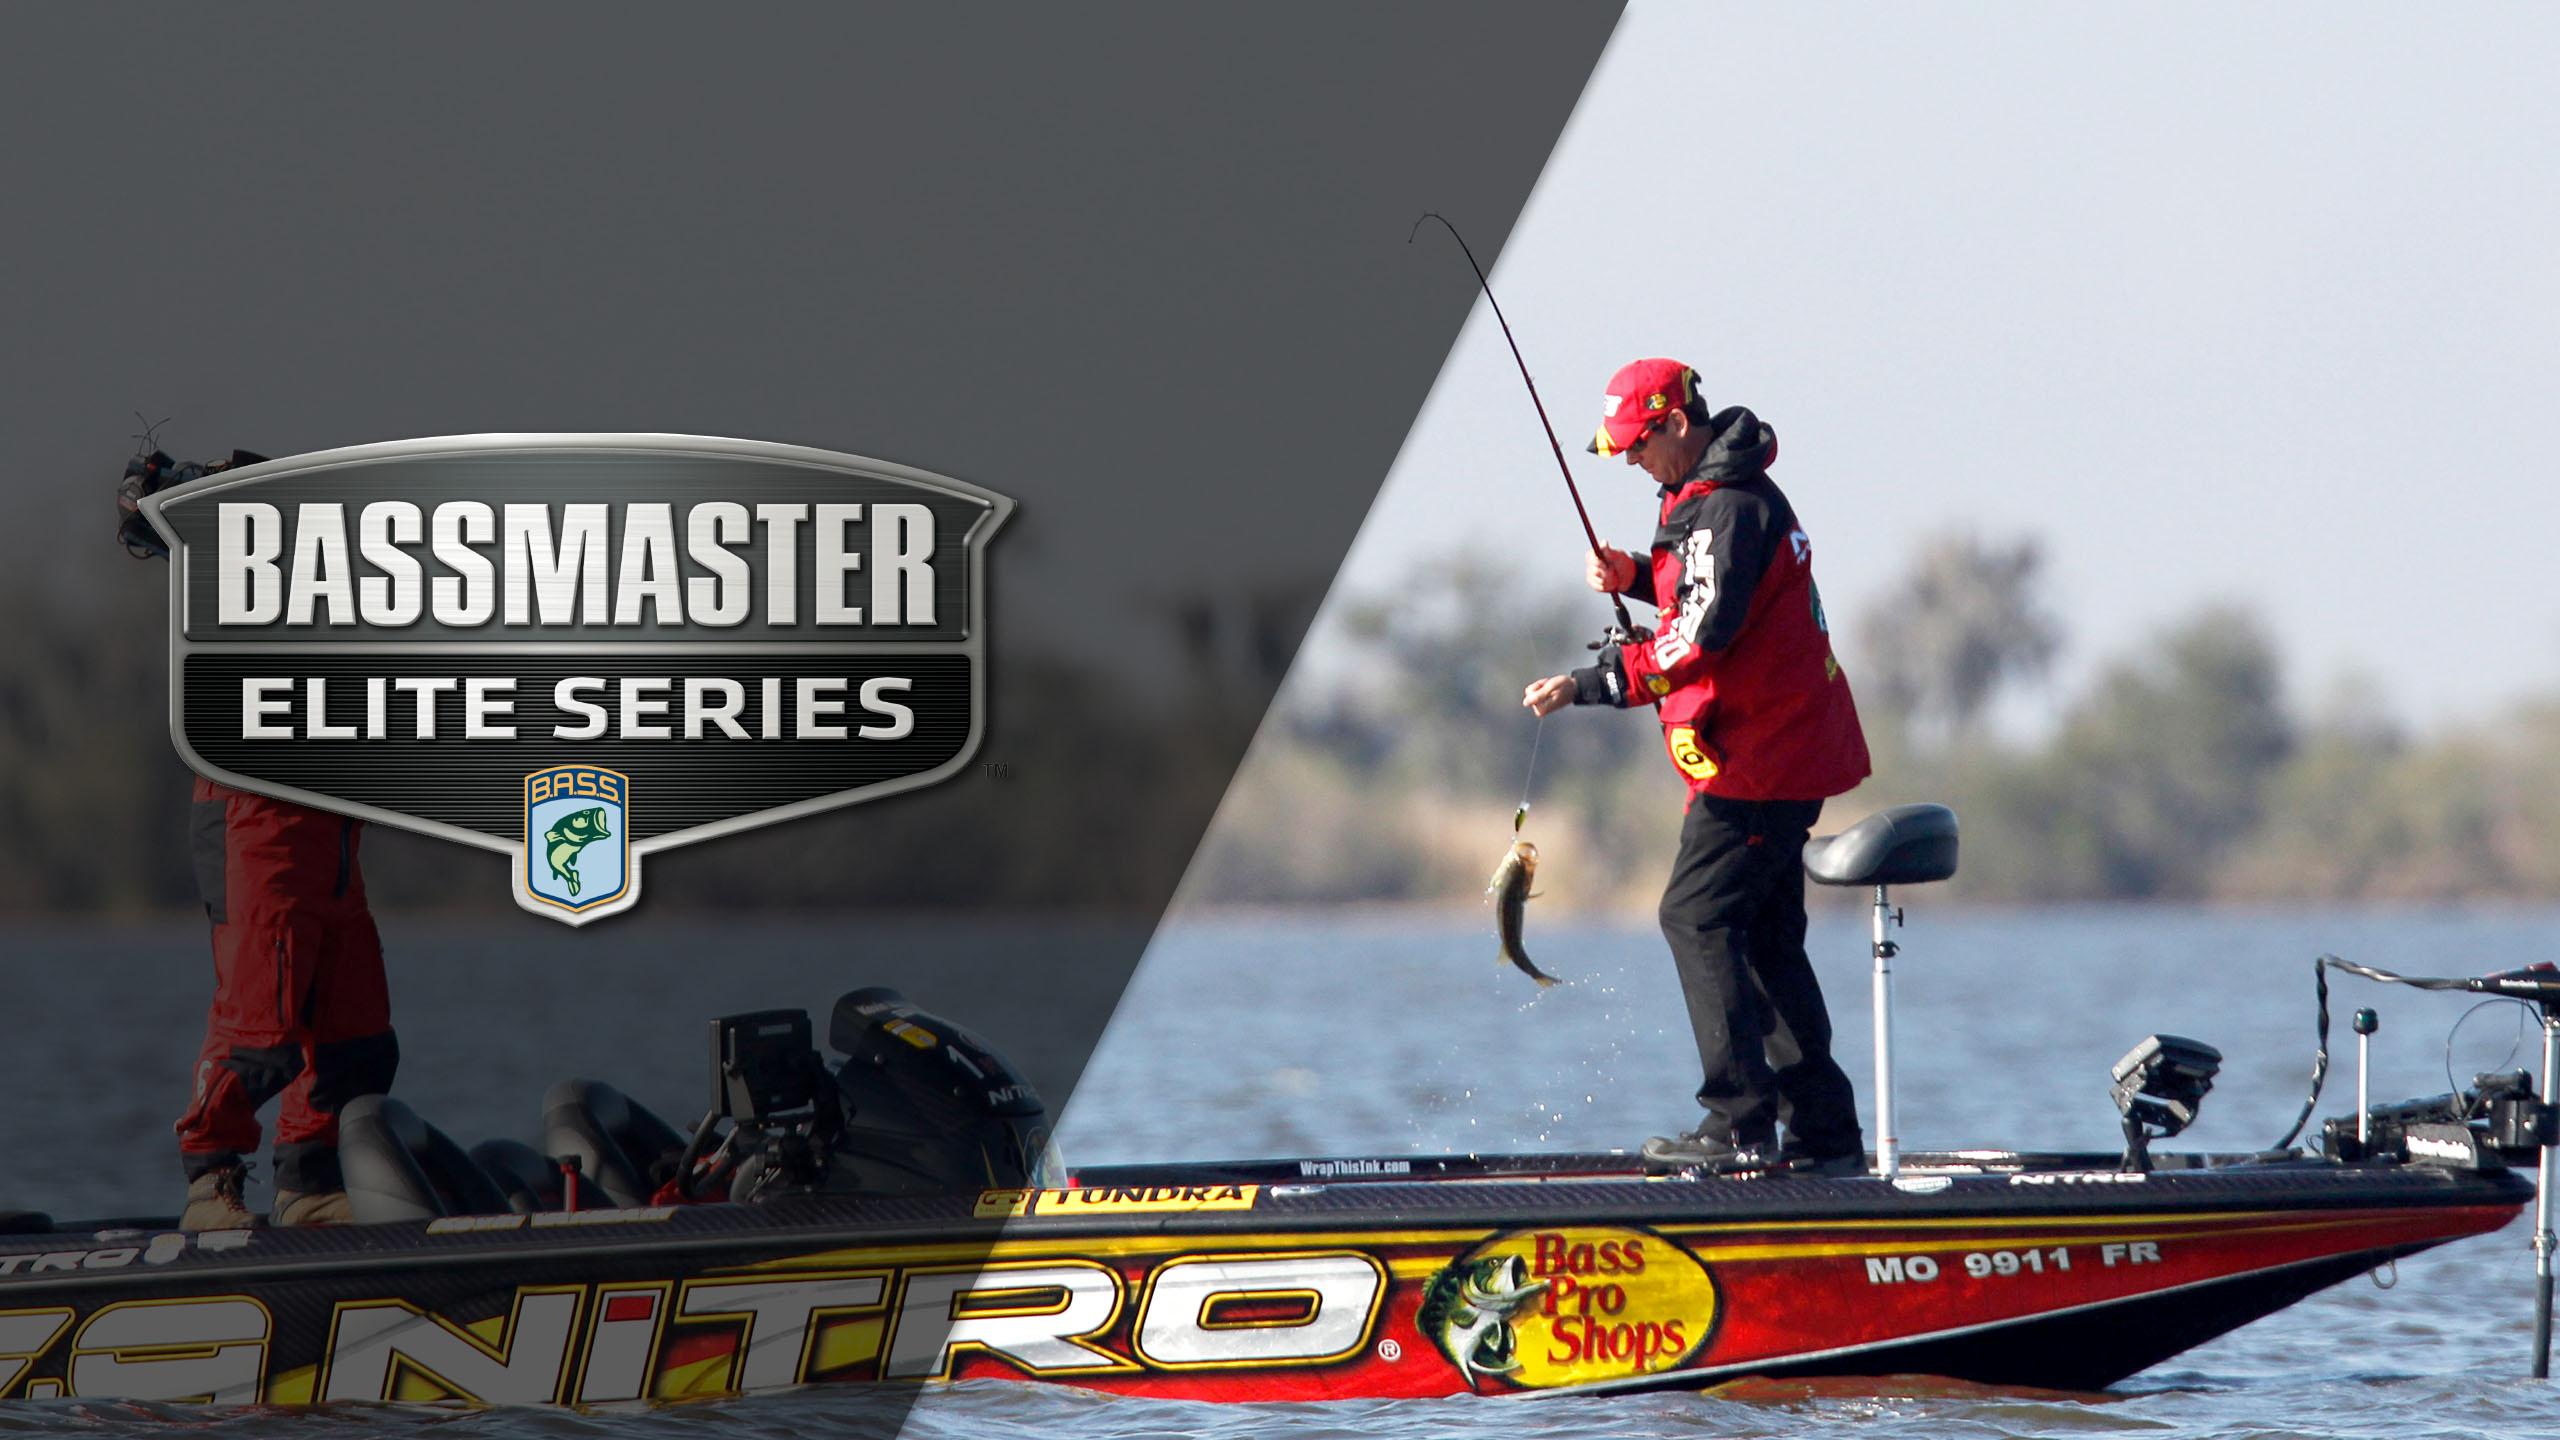 Mossy Oak Fishing Bassmaster High School Championship presented by DICK's Sporting Goods